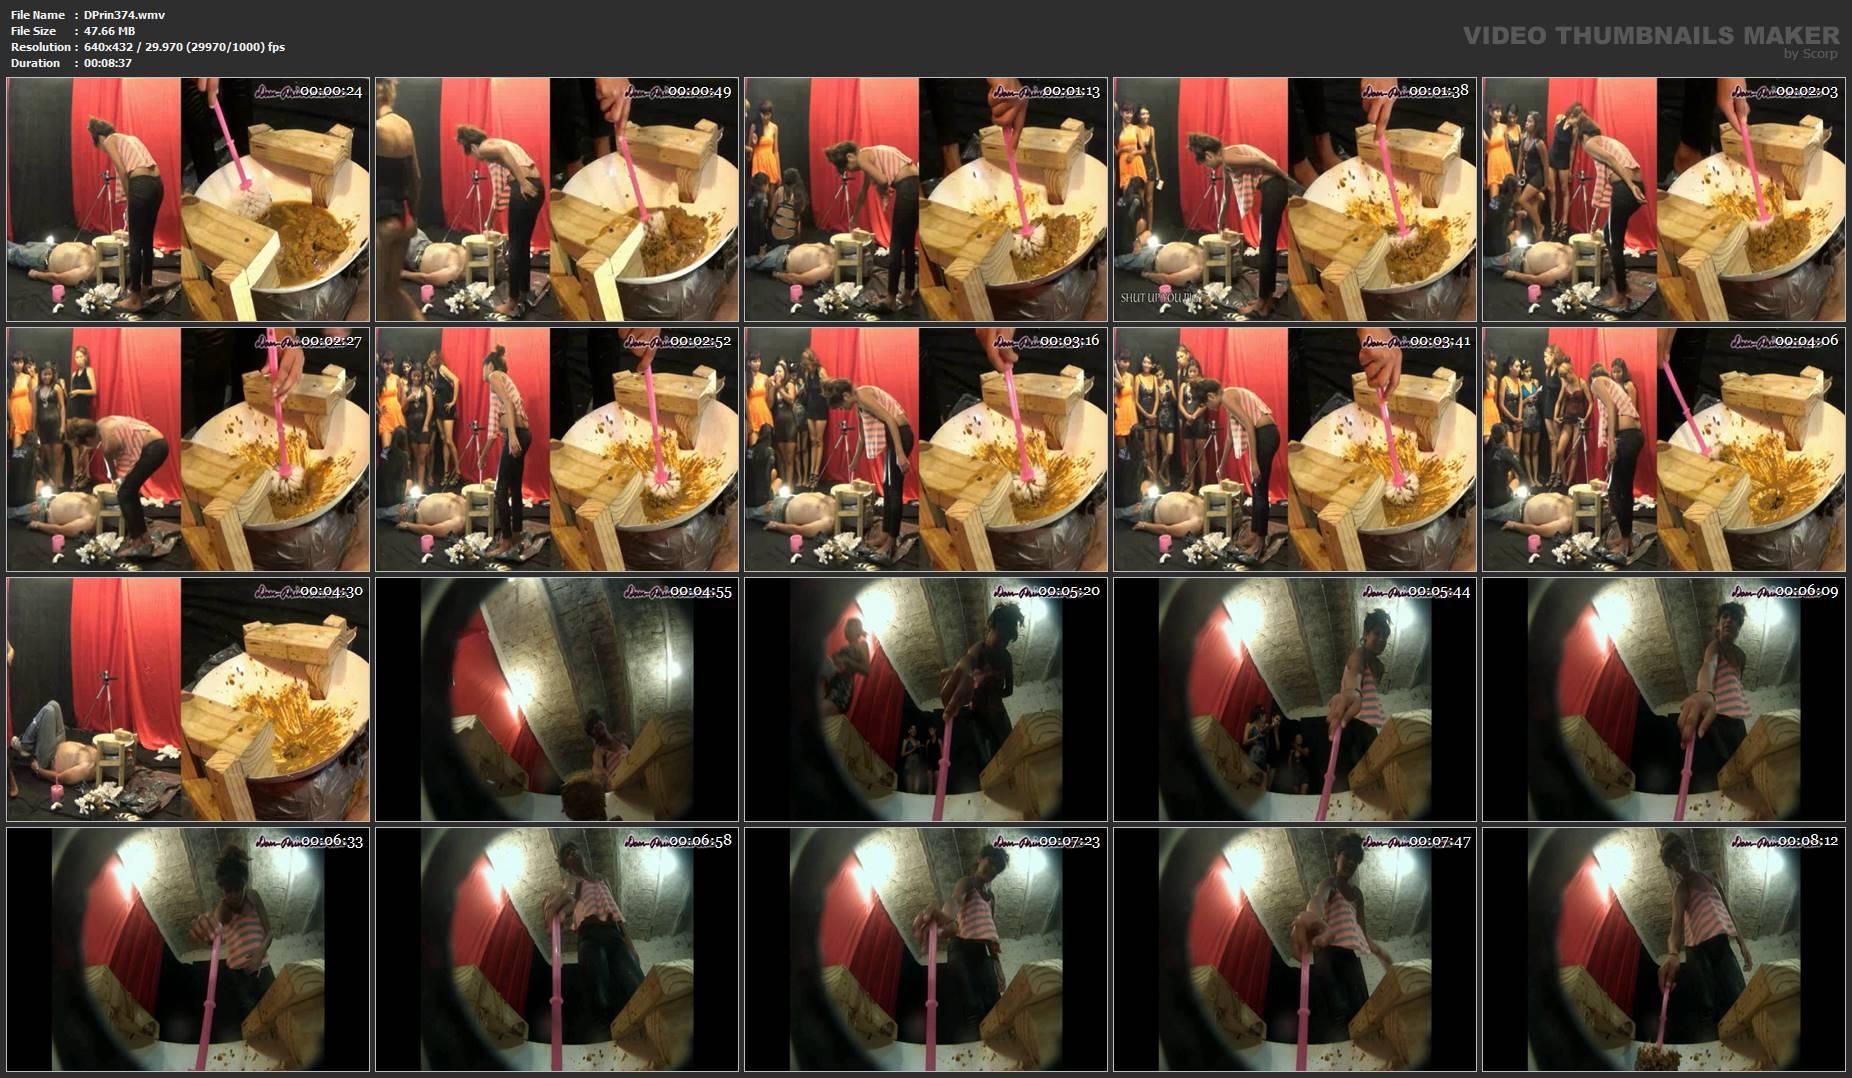 [DOM-PRINCESS] Dark Toilet Ideas The next Level Part 09 The Feeding [SD][432p][WMV]